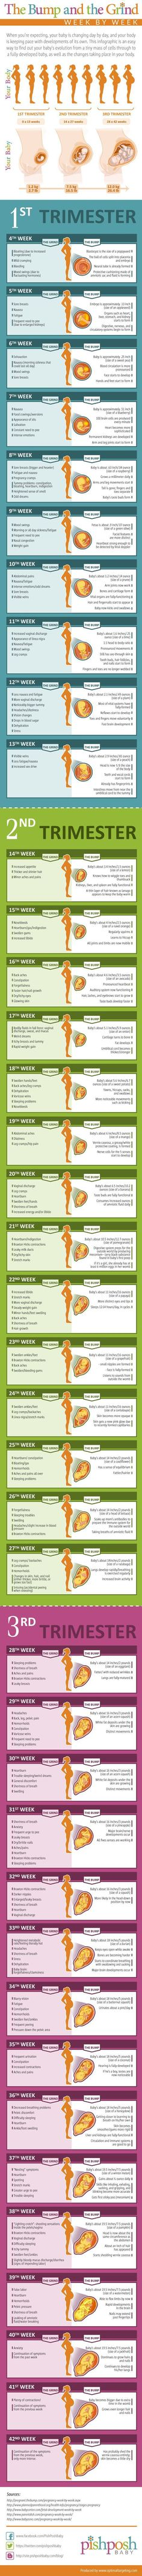 Pregnancy Week by Week Chart - Fun - - Schwanger - Pregnant Tips Pregnancy Chart, Pregnancy Info, Pregnancy Weeks, Early Pregnancy, Pregnancy Stages, Pregnancy Timeline, Pregnancy Trimester Chart, Pregnancy Health, Pregnancy Facts